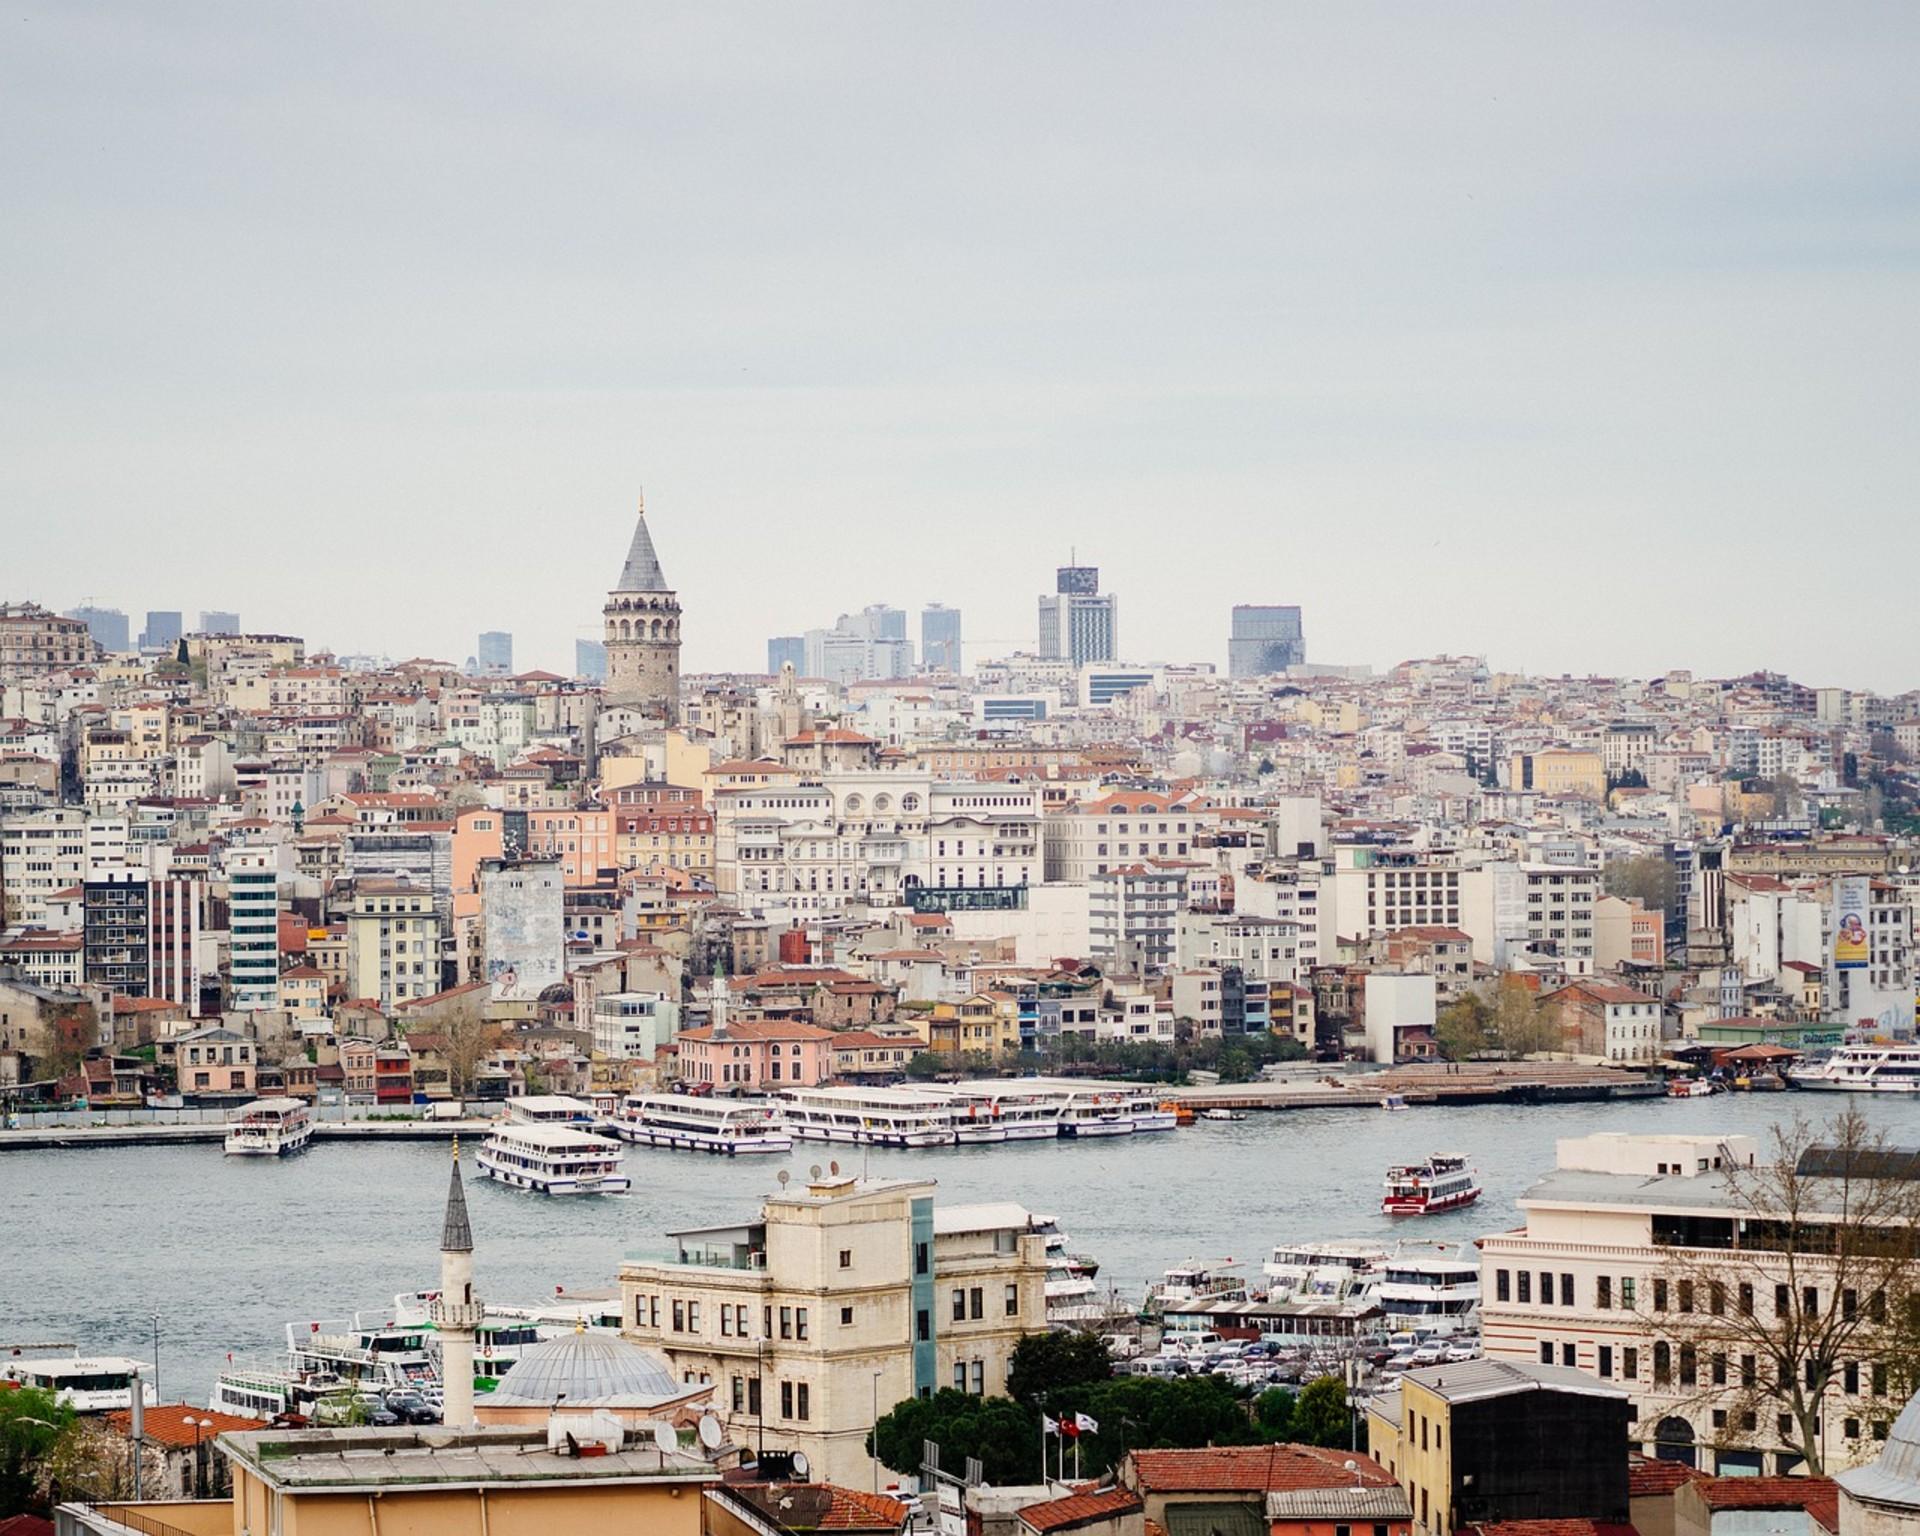 istanbul-4307665_1280.jpg